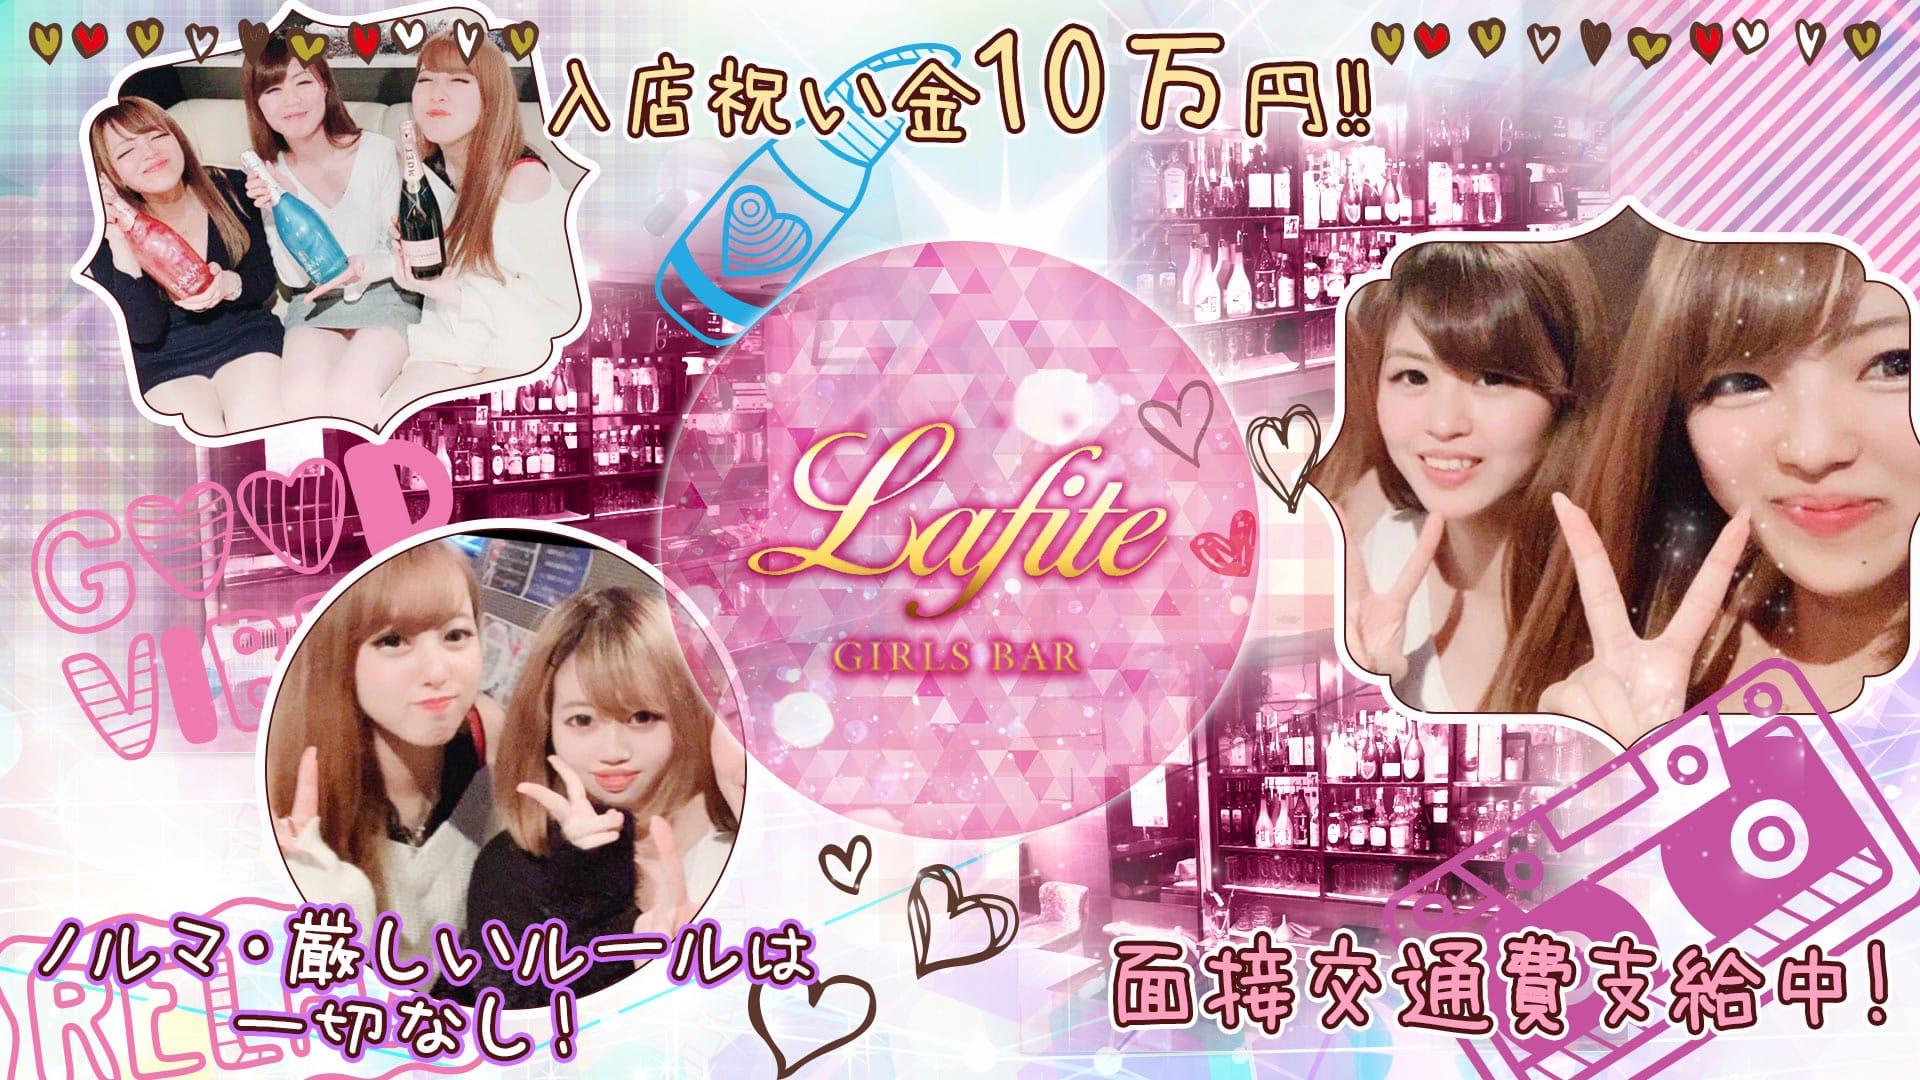 GIRLS BAR Lafite<ラフィット> 大宮 ガールズバー TOP画像